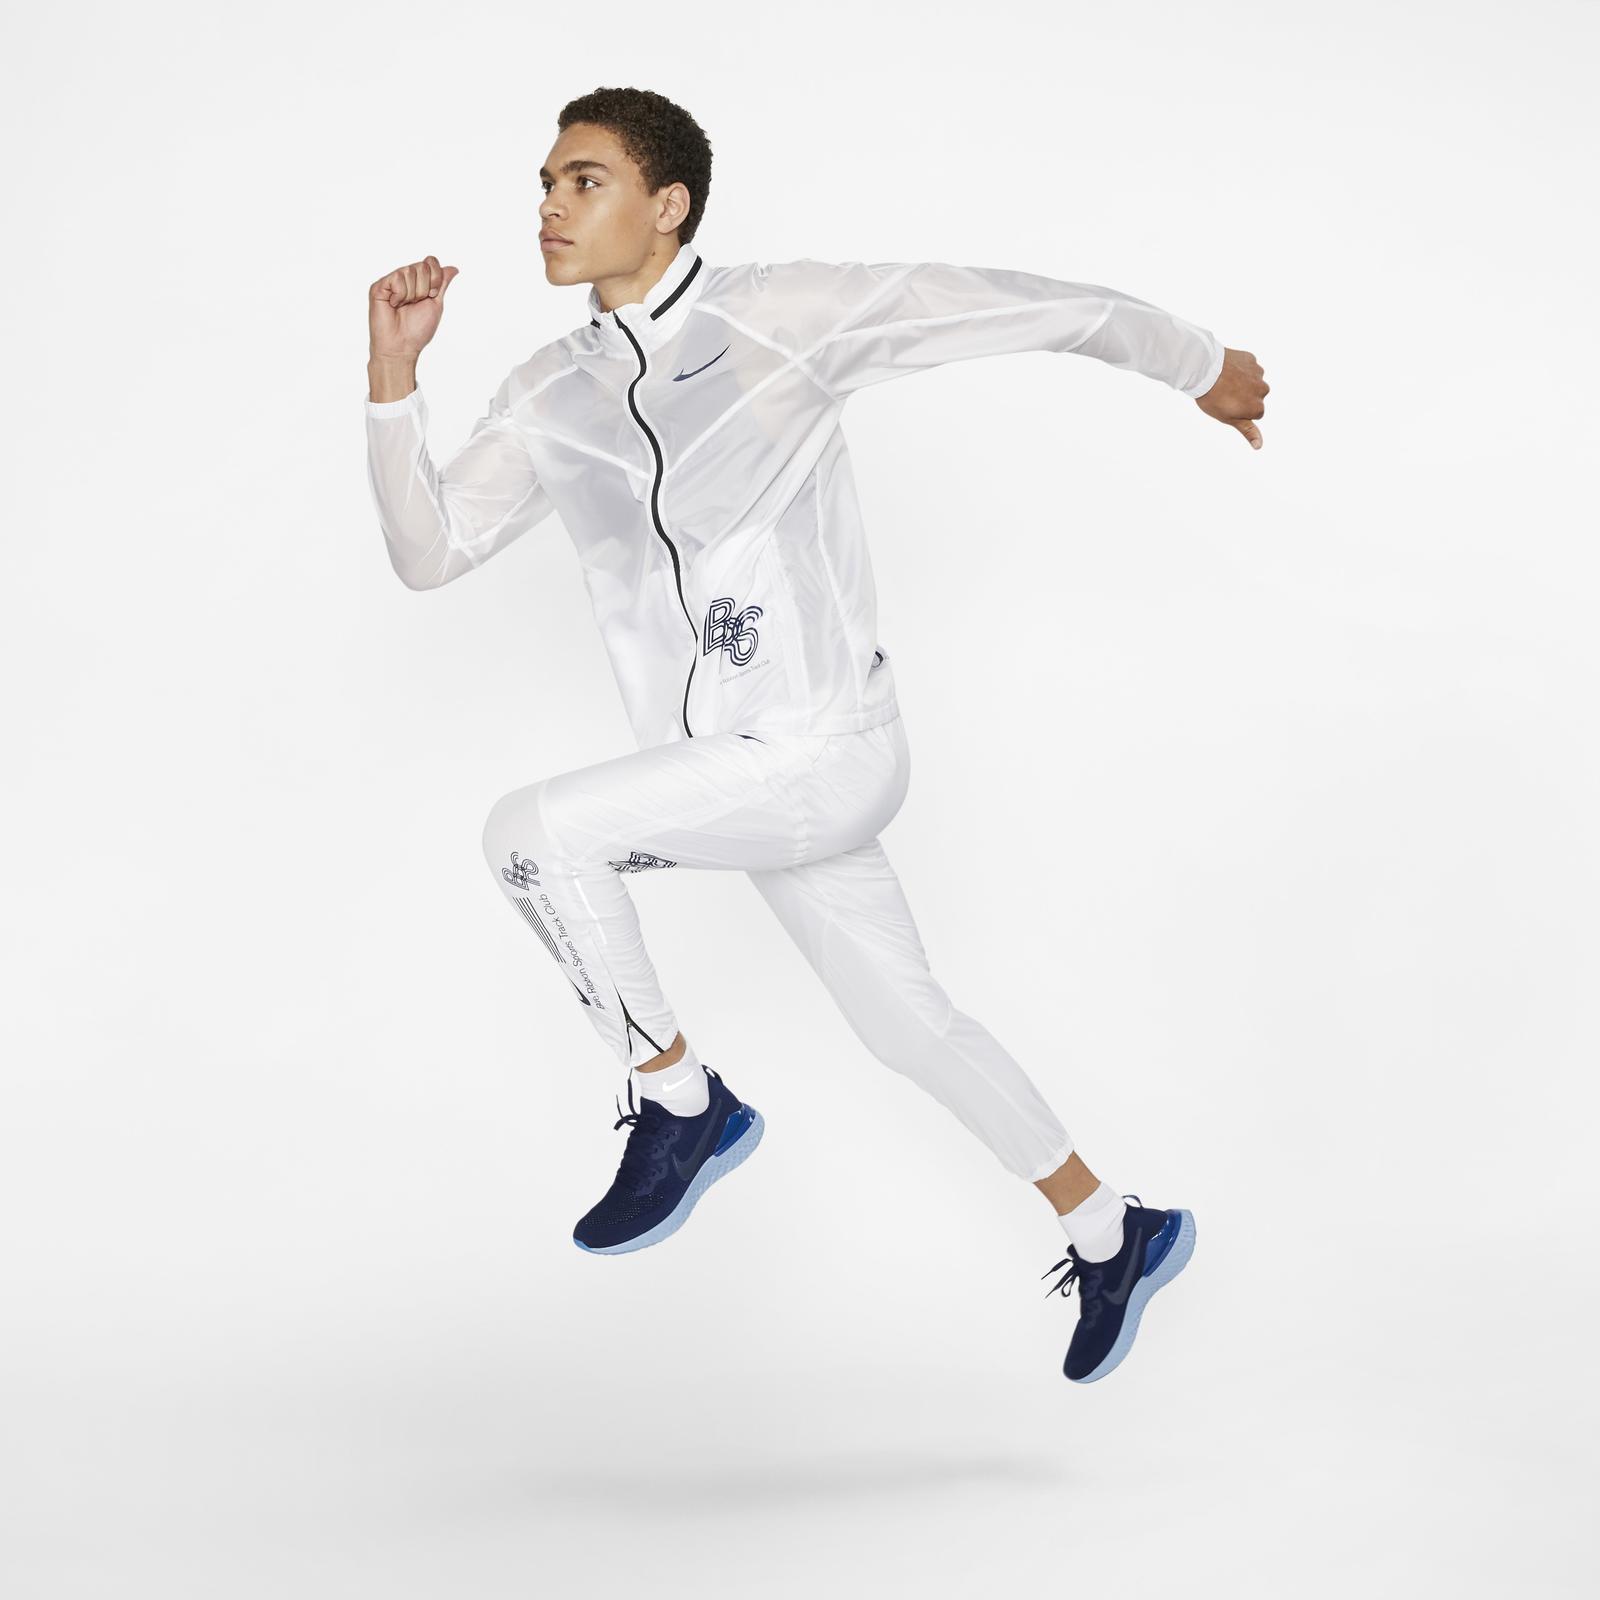 b50e9d7ae9b58 Nike BRS (Blue Ribbon Sports) Pack 0